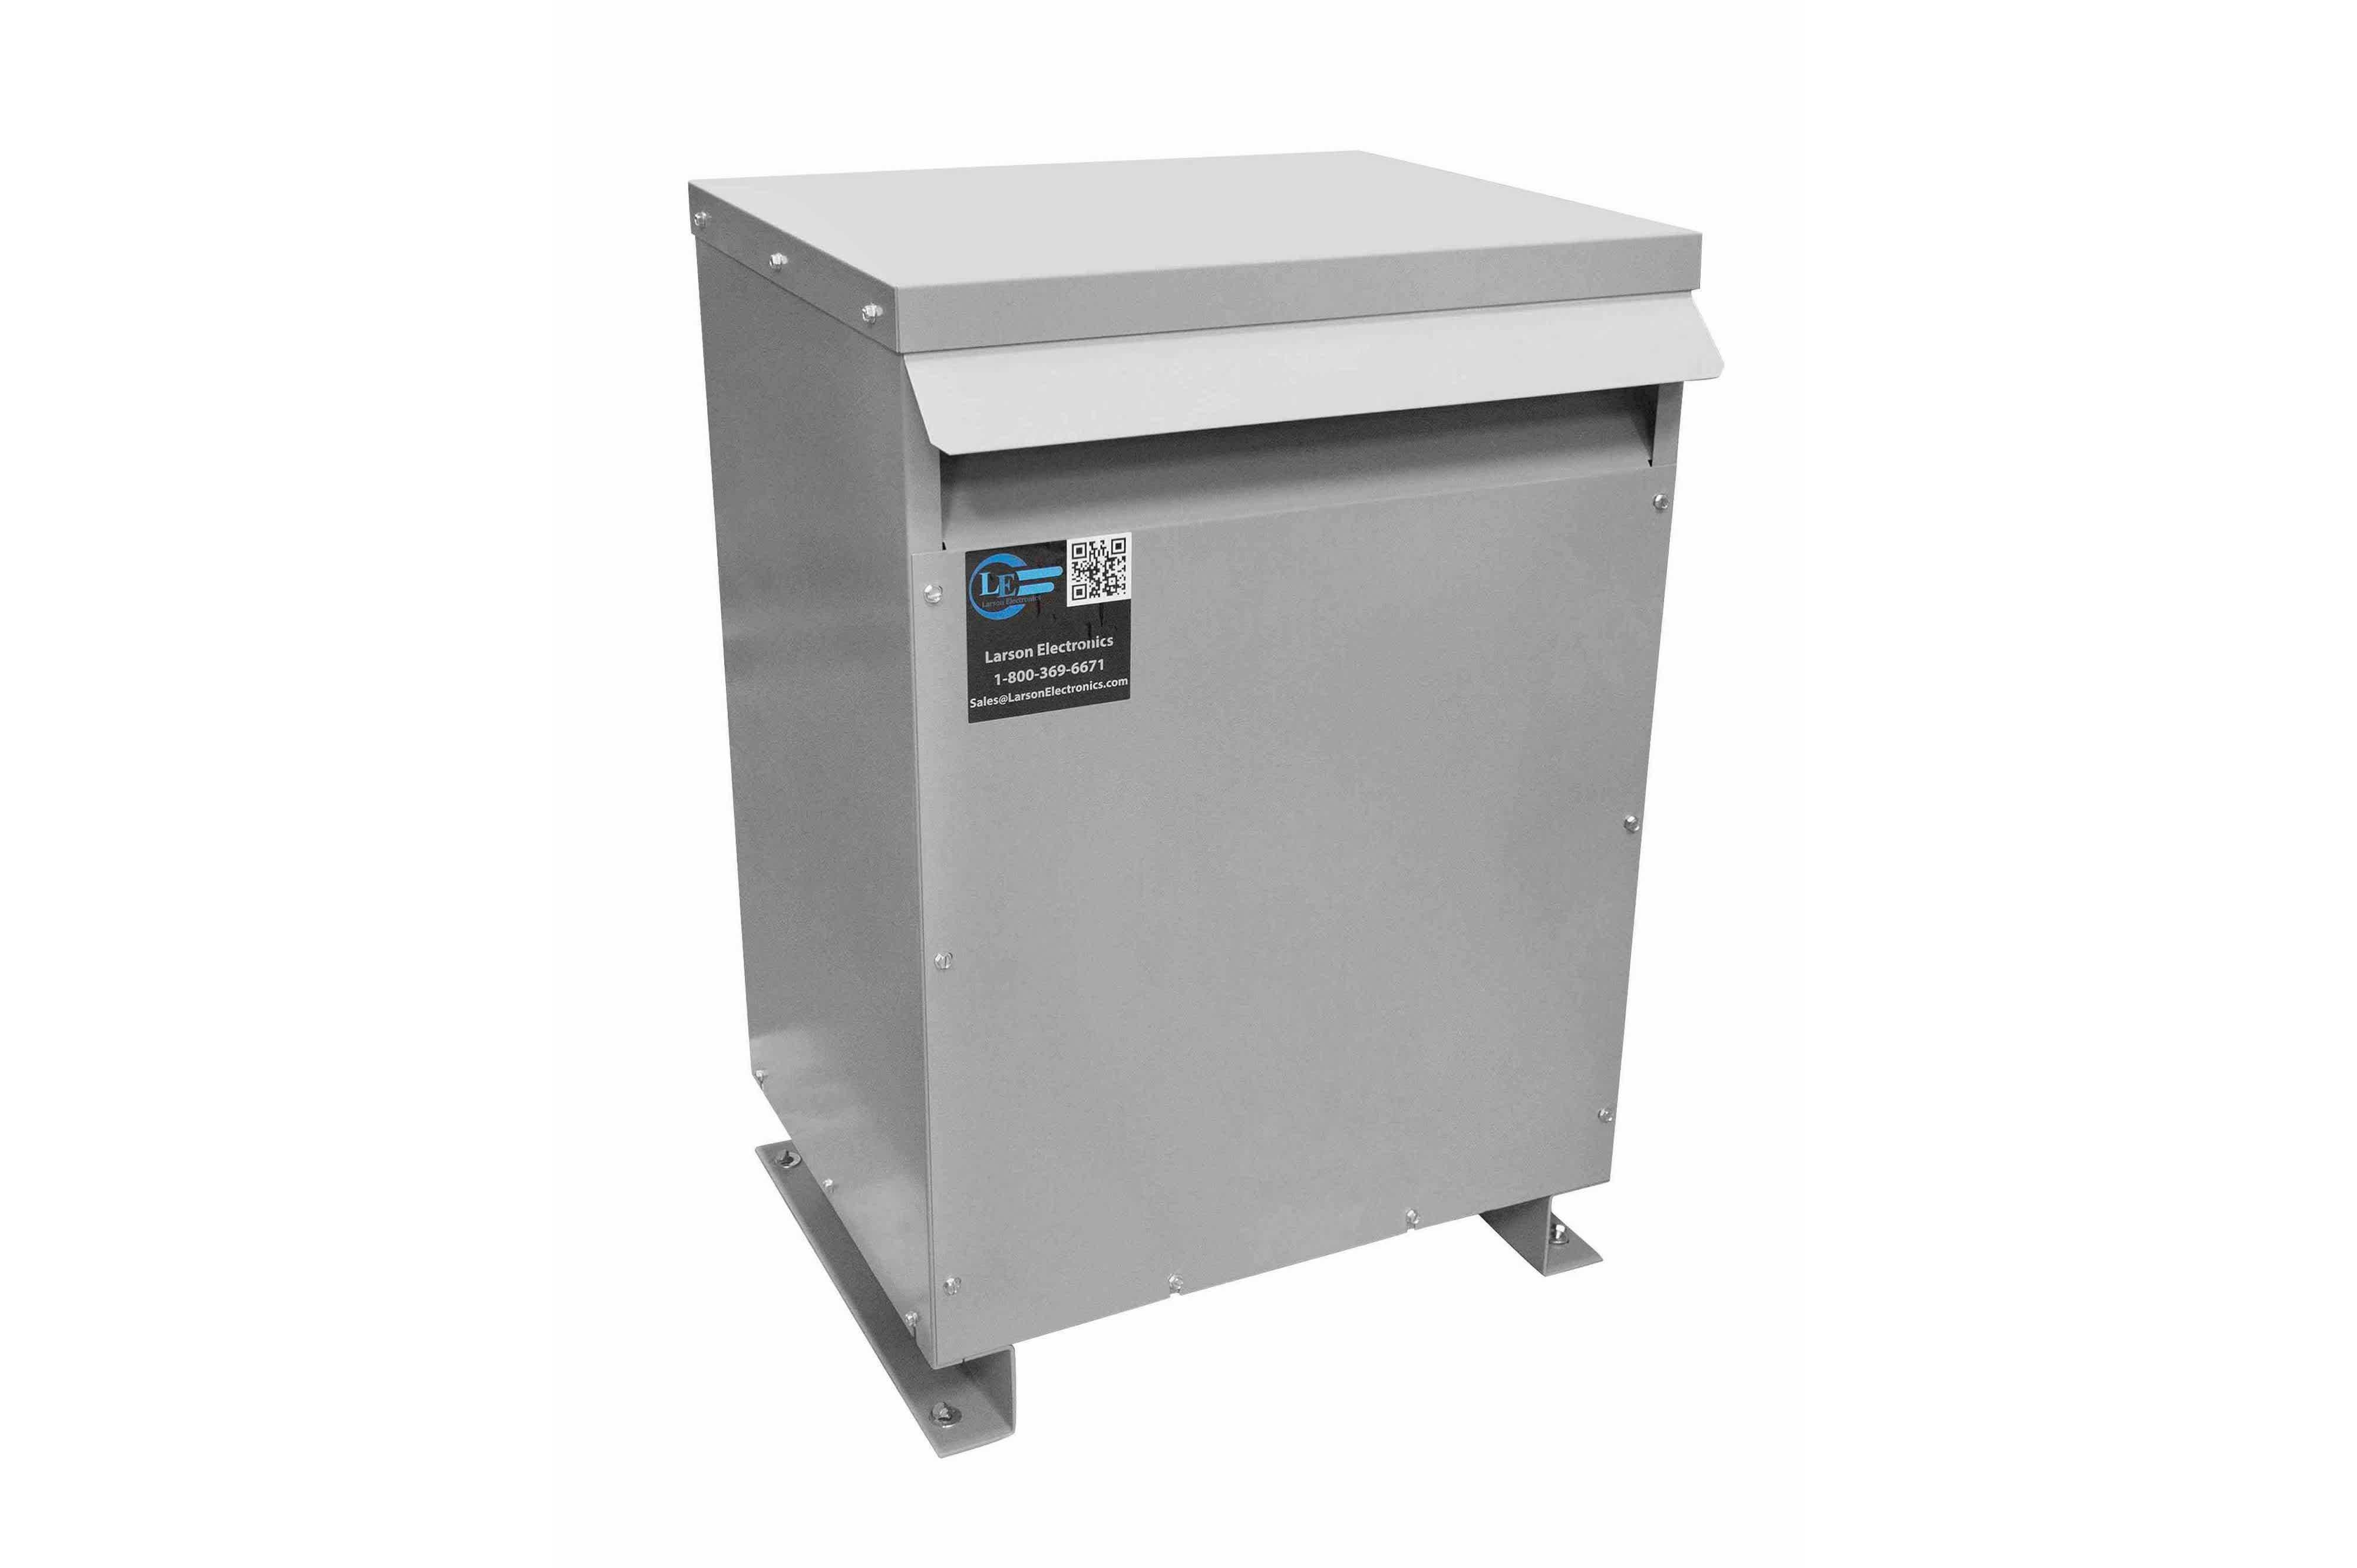 1000 kVA 3PH Isolation Transformer, 230V Wye Primary, 480V Delta Secondary, N3R, Ventilated, 60 Hz